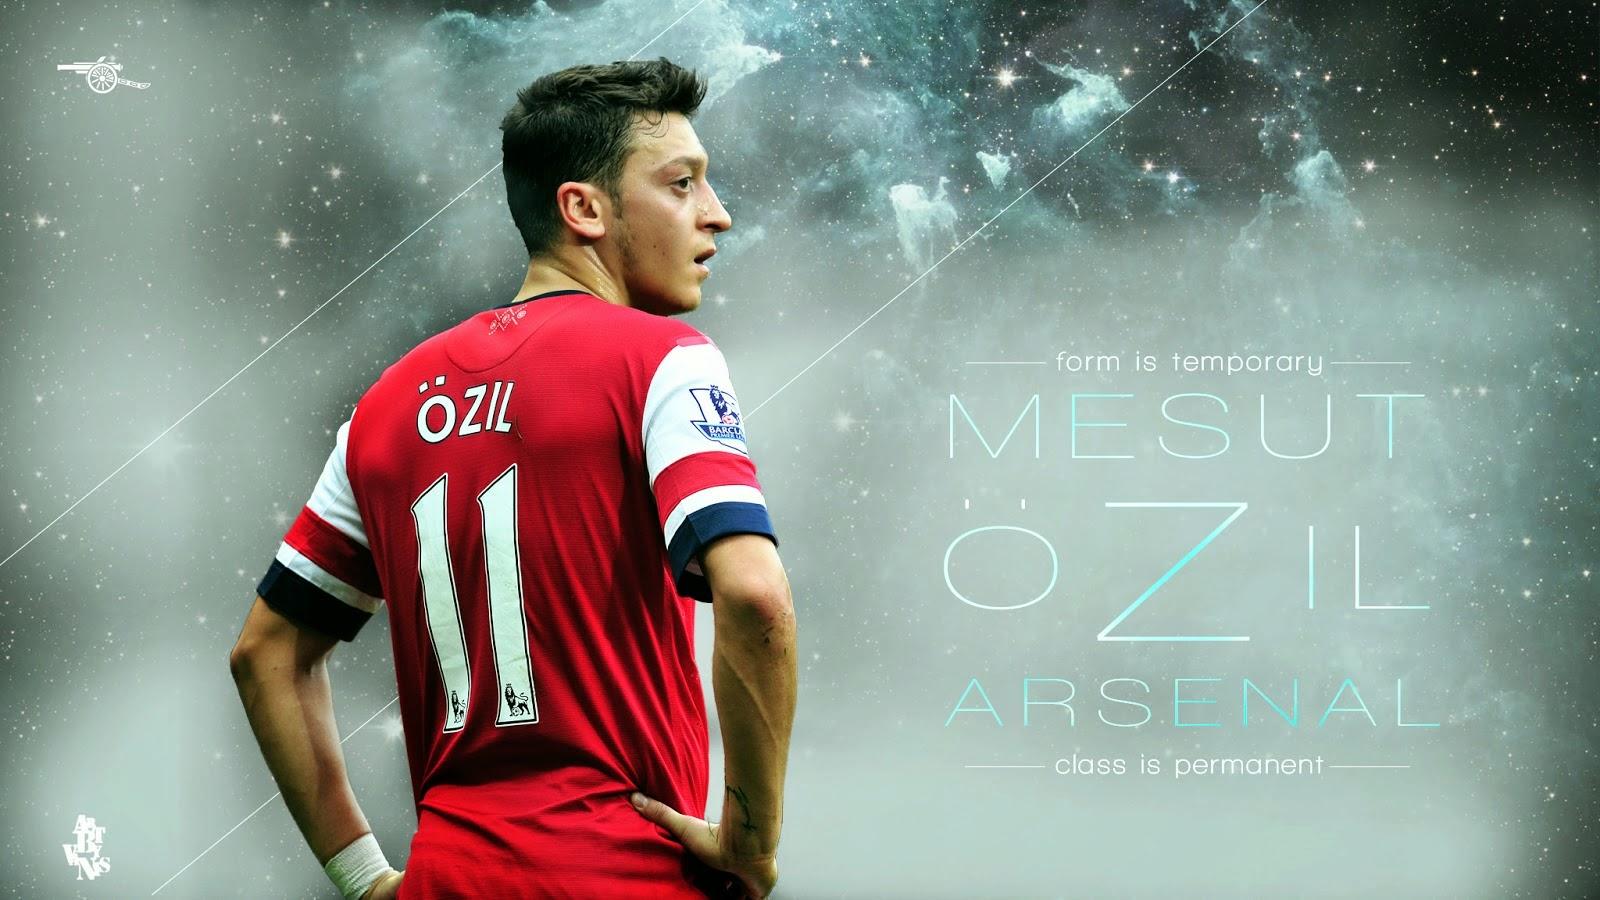 Words Celebrities Wallpapers: Mesut Ozil Latest HD